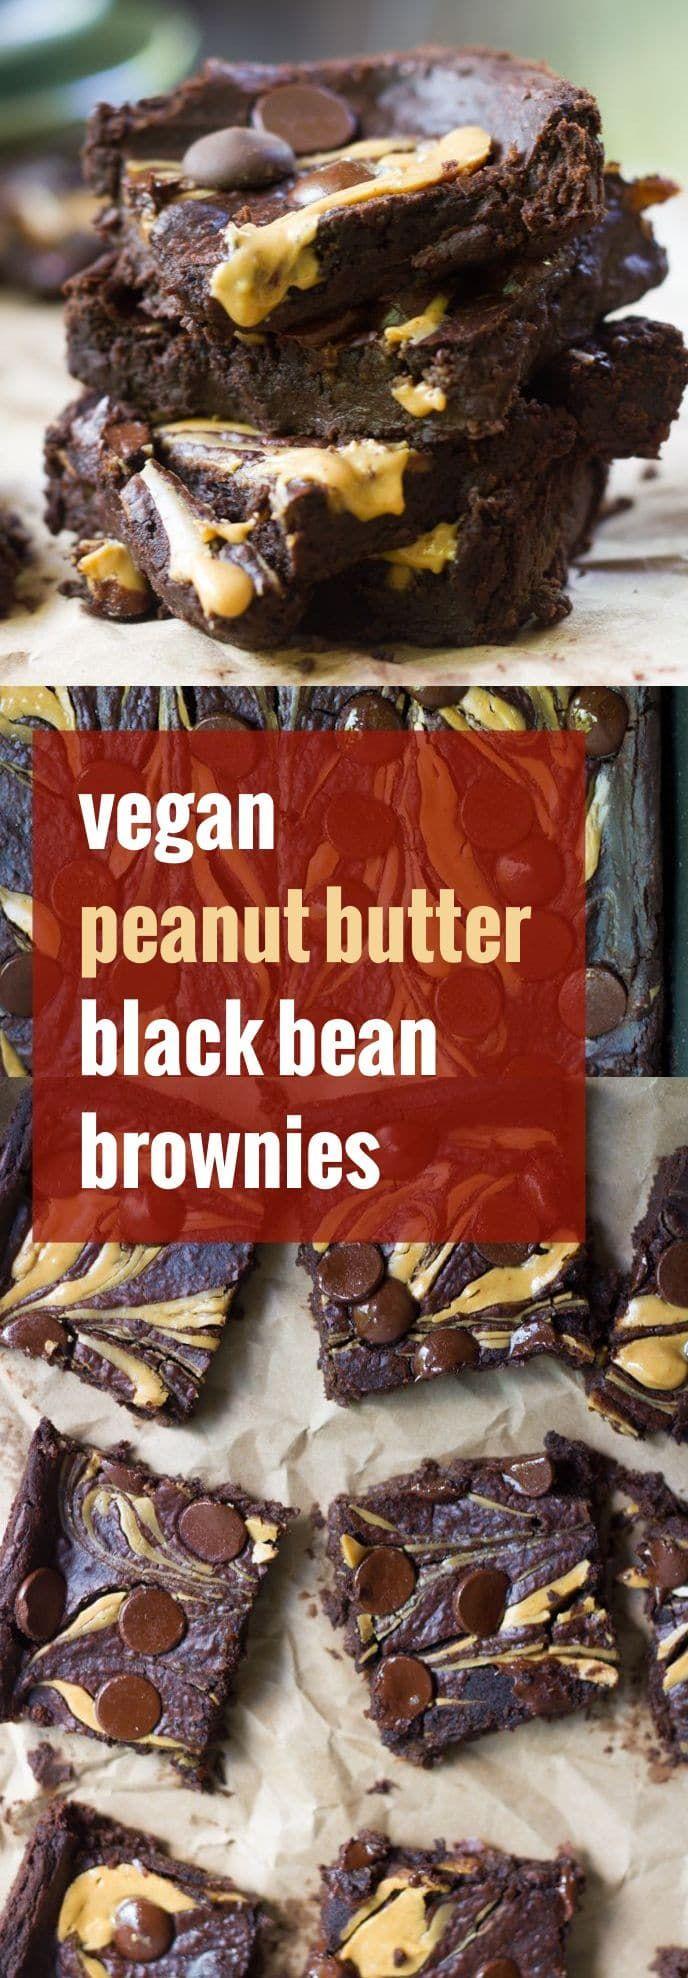 Peanut Butter Swirl Vegan Black Bean Brownies